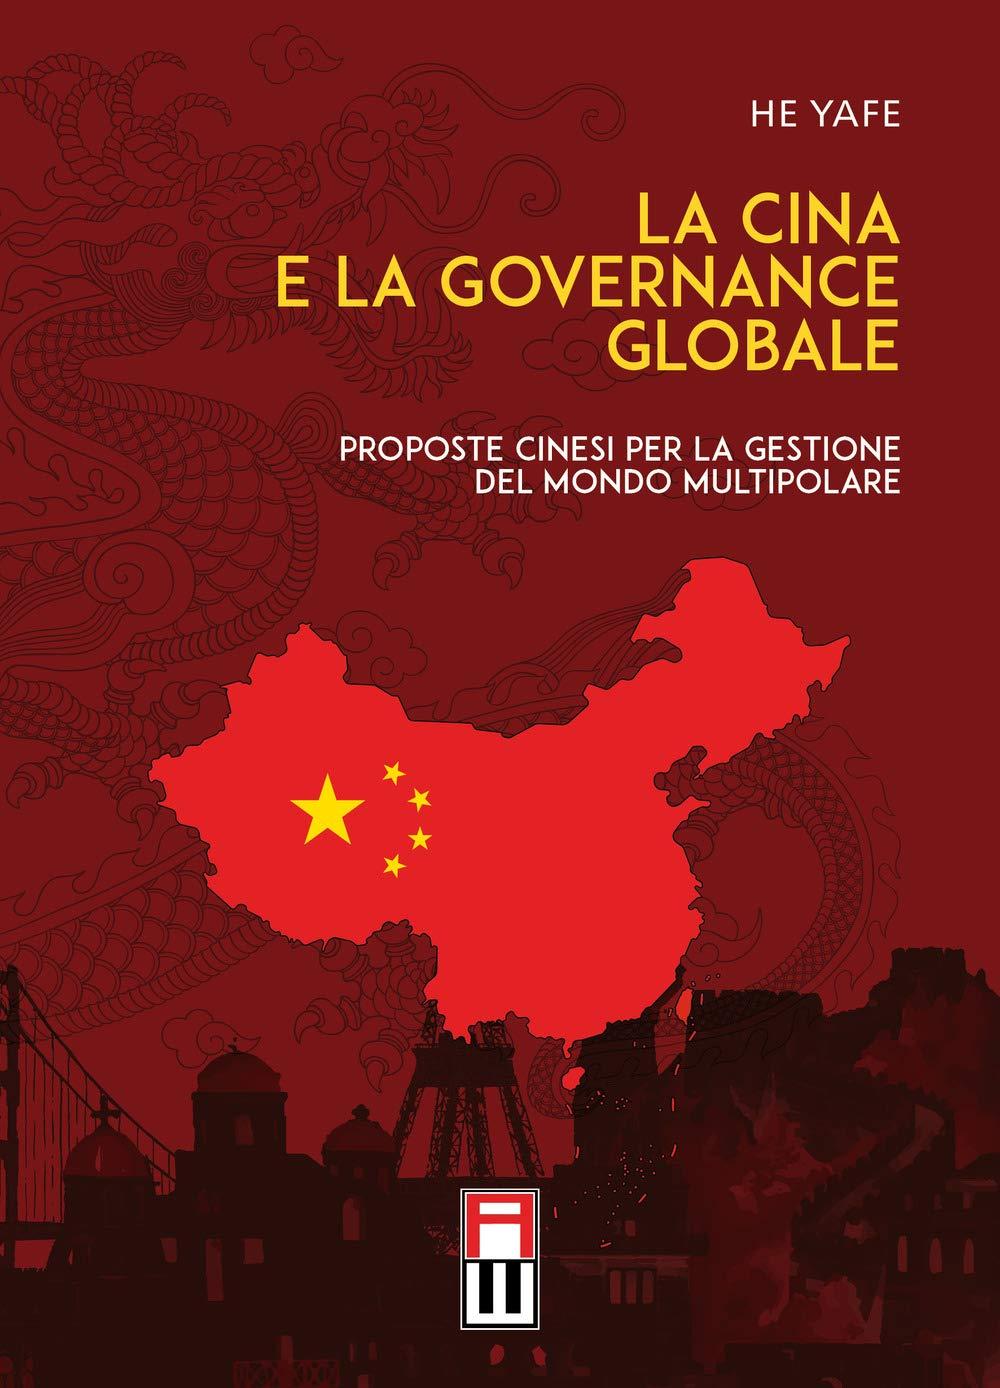 La Cina e la governance globale